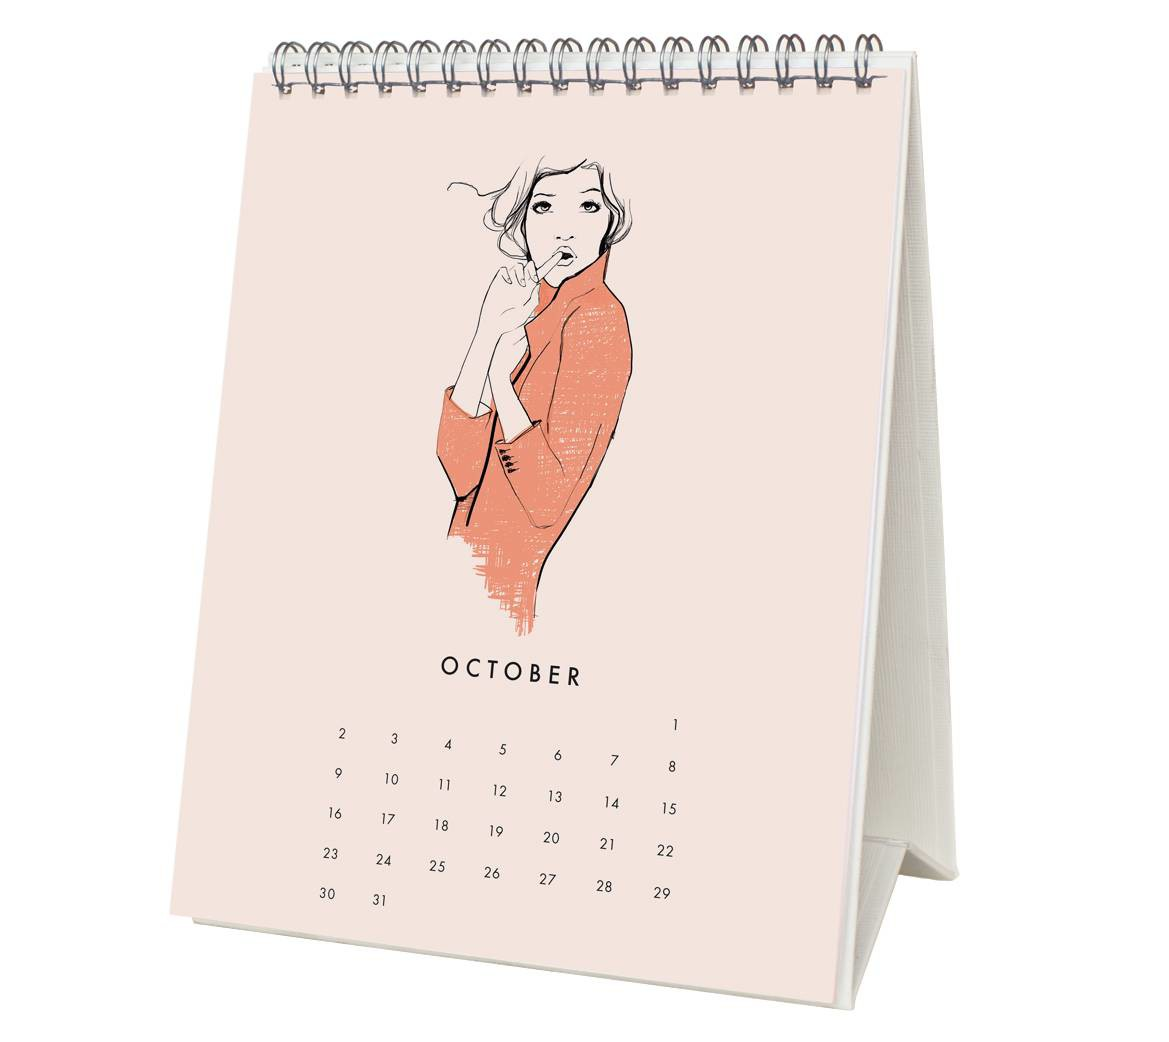 Garance Dore 2016 Desk Calendar - October